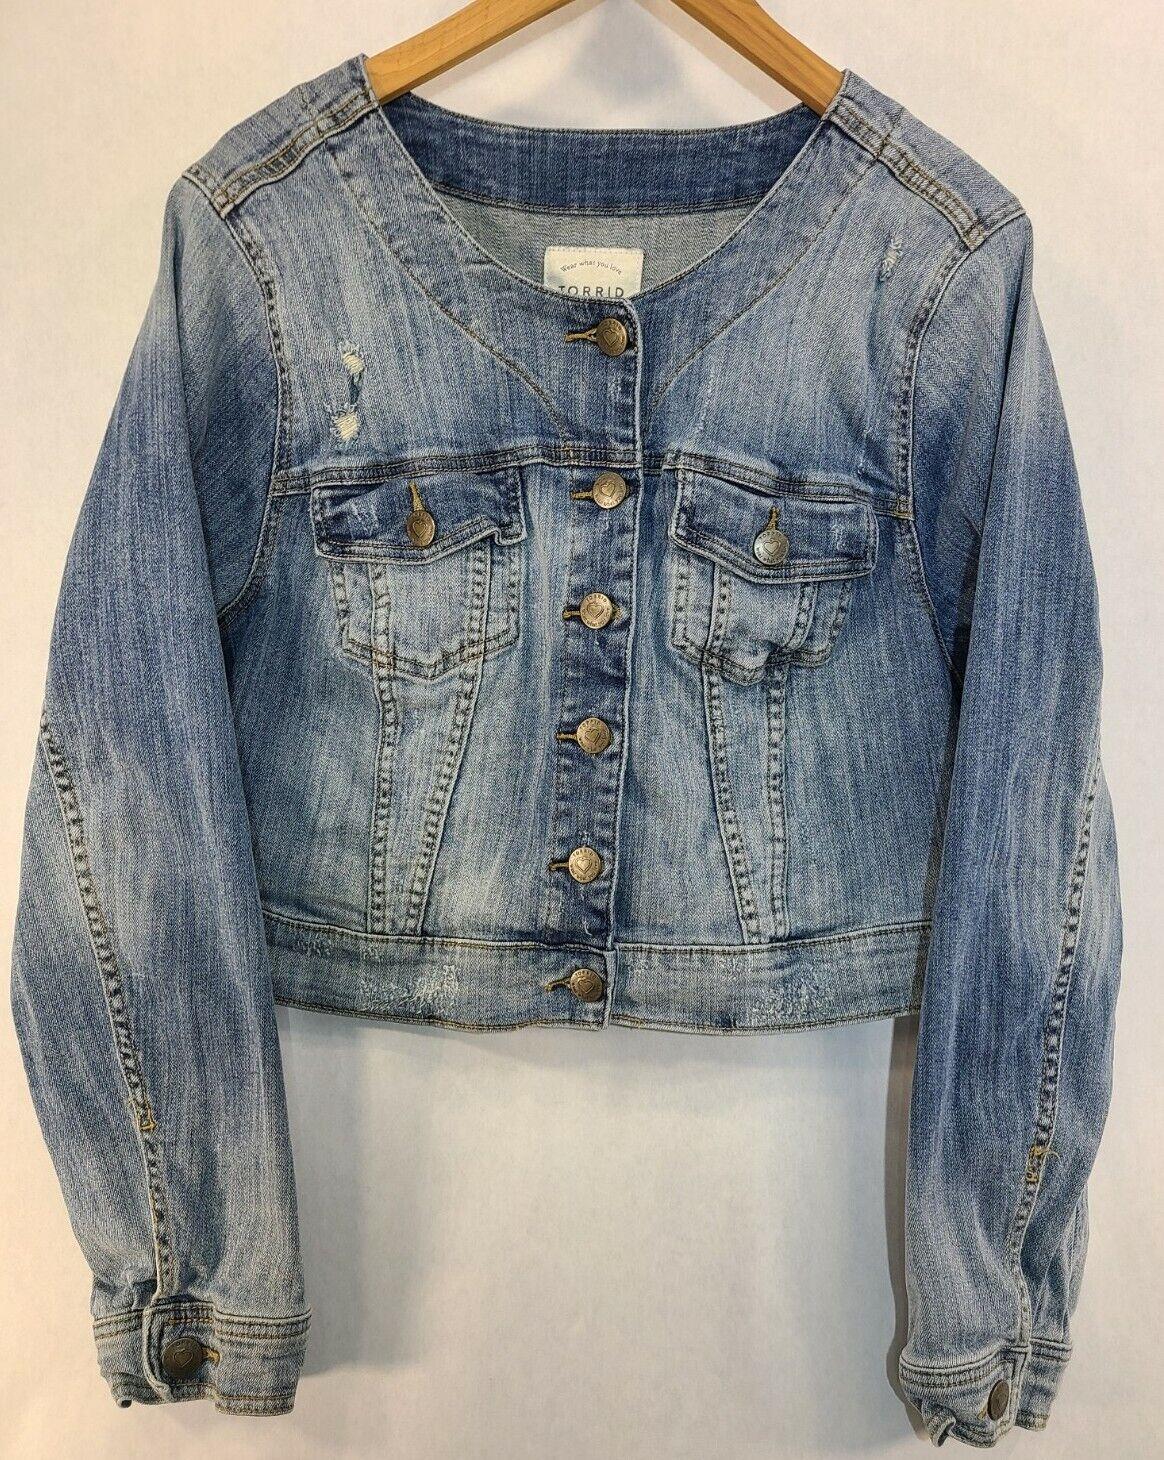 Torrid 2 18 20 Jacket Denim Jean Cropped Light Wash Long Sleeve Button Distress